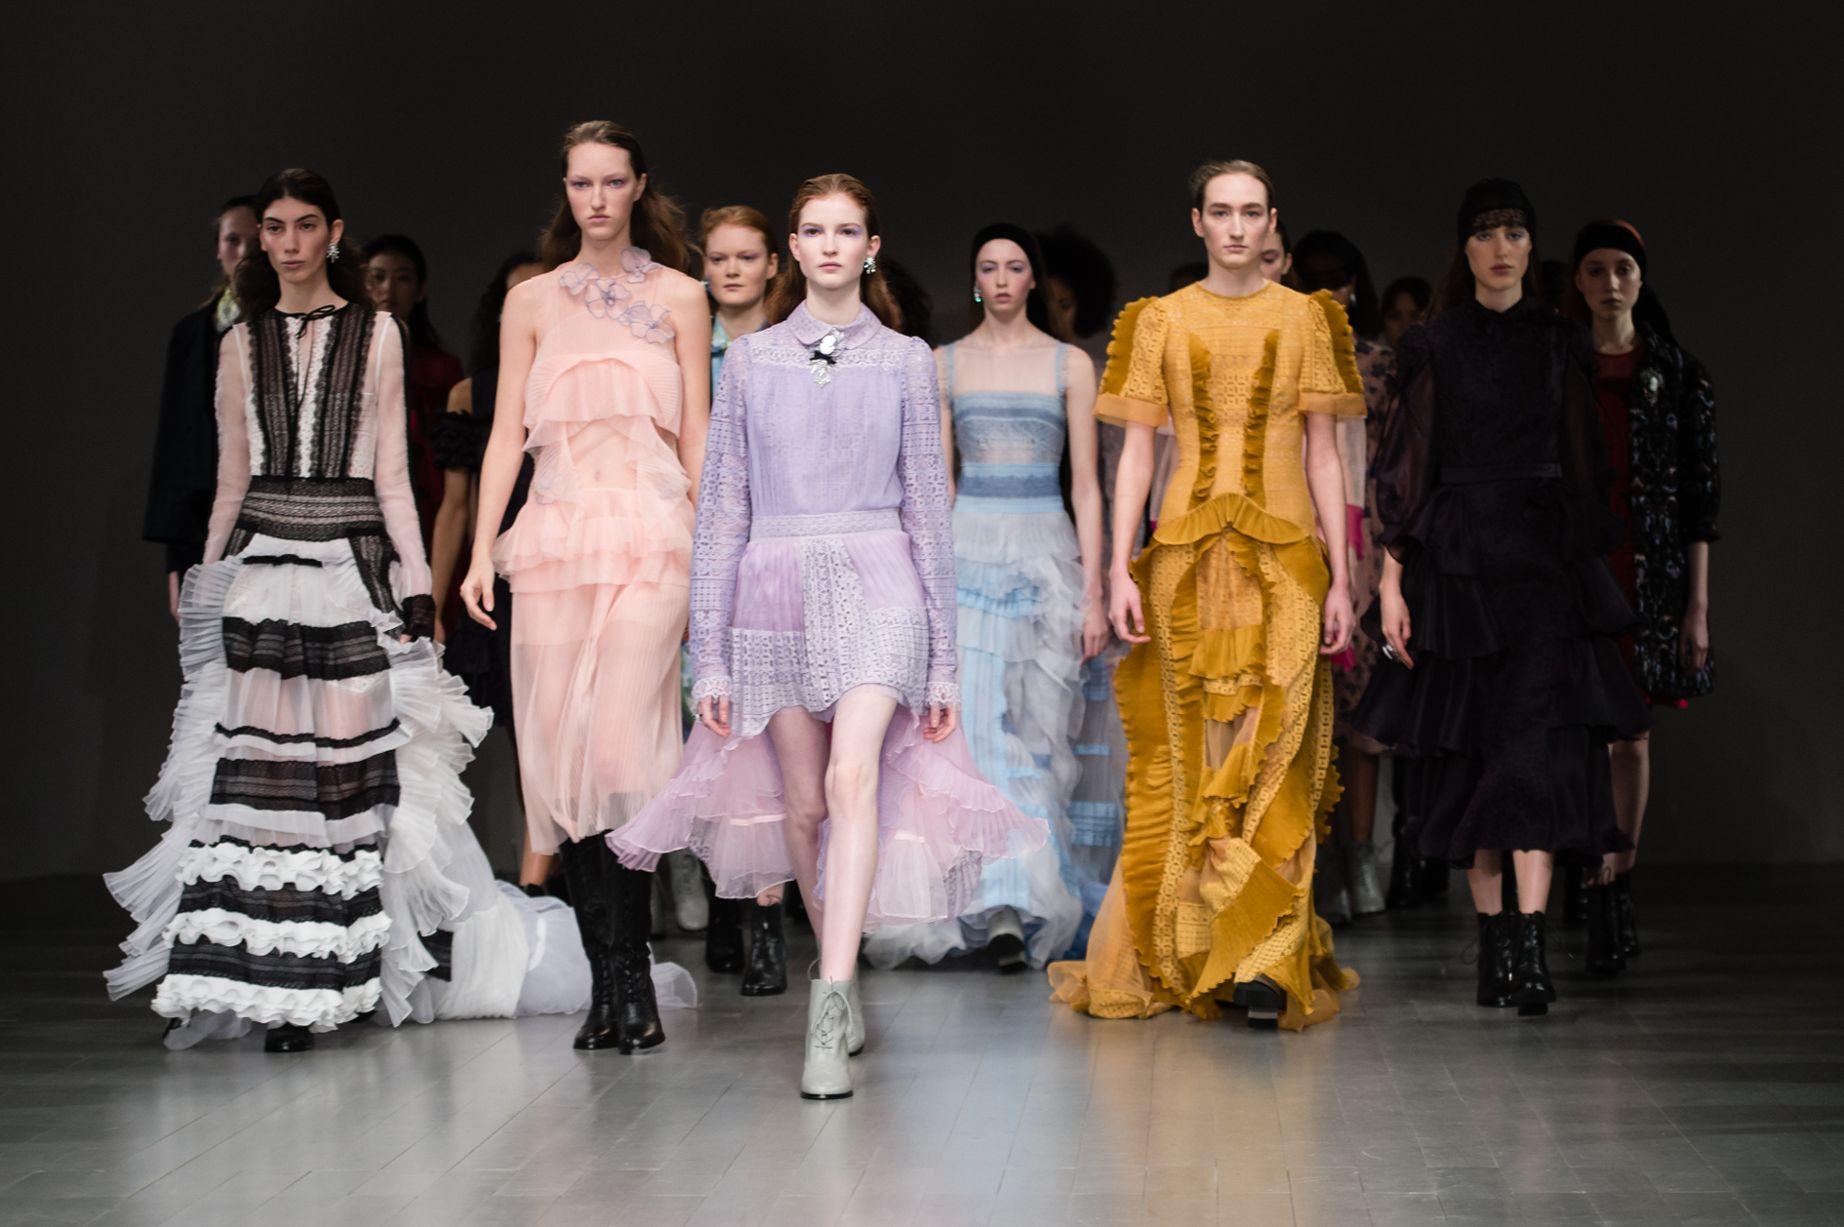 bora-aksu-show-runway-fall-winter-2018-london-fashion-week-uk-16-feb-2018.jpg